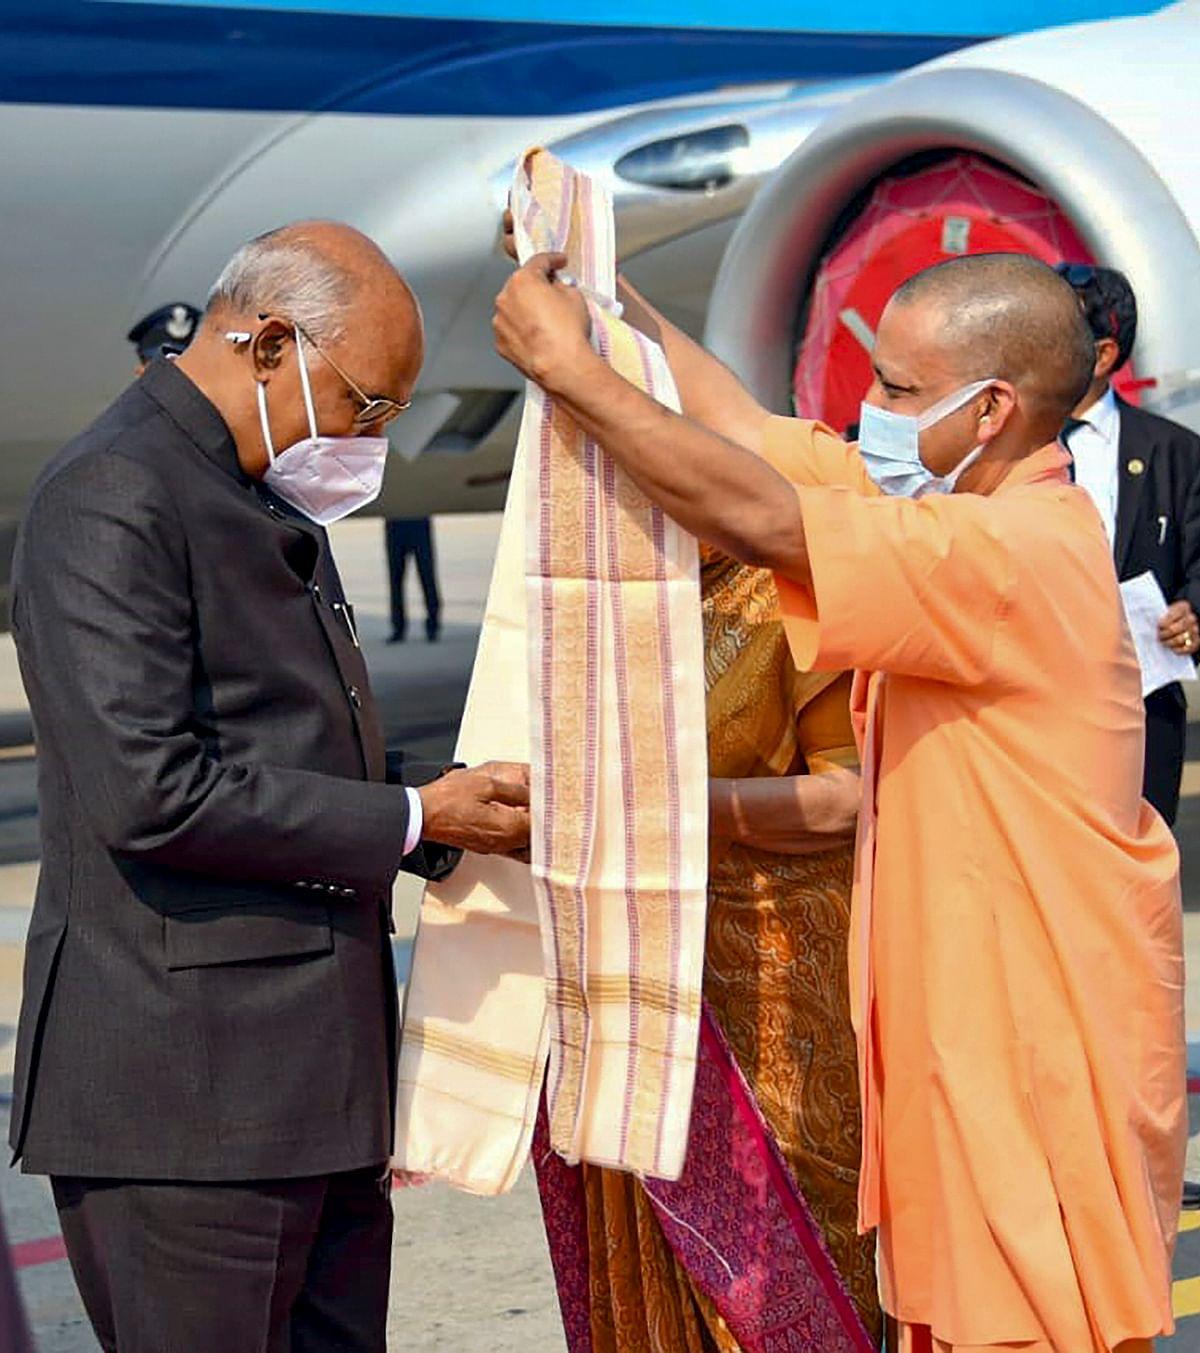 Uttar Pradesh: President Kovind offers prayers at Kashi Vishwanath temple, CM Yogi Adityanath and Guv Anandiben Patel present -- see pics